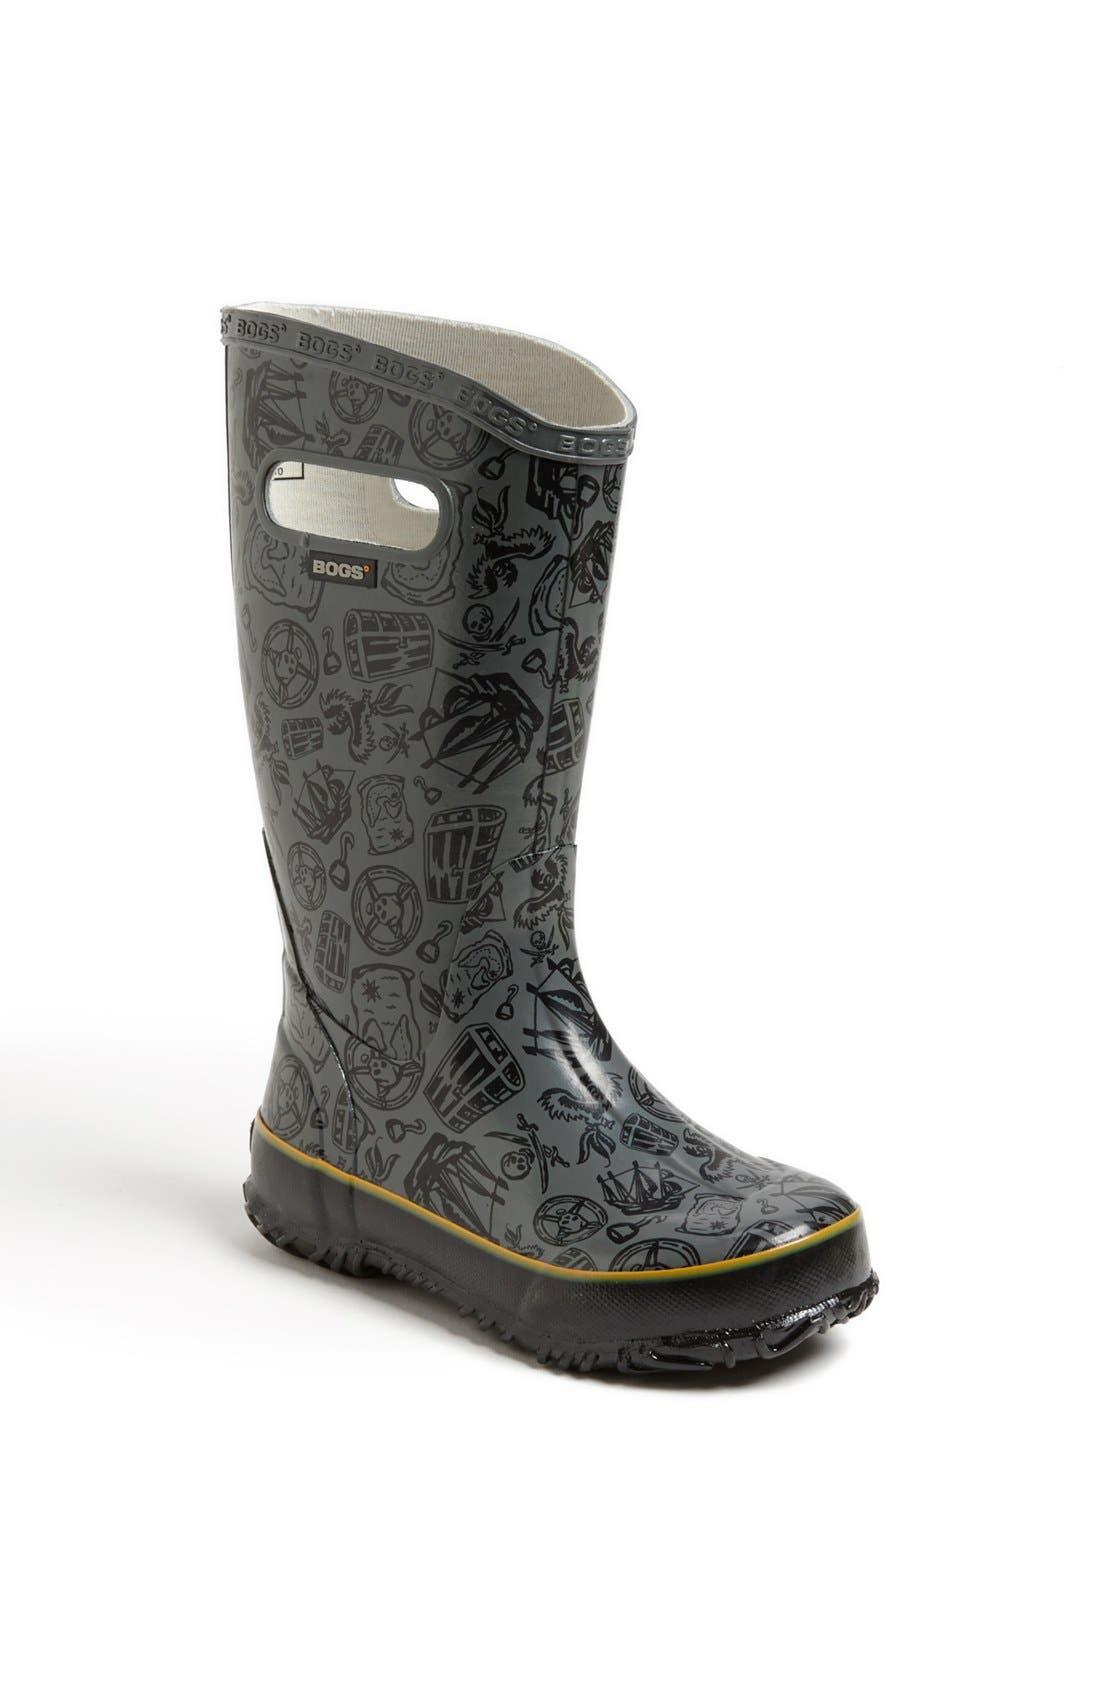 Alternate Image 1 Selected - Bogs 'Pirate' Rain Boot (Walker, Toddler, Little Kid & Big Kid)